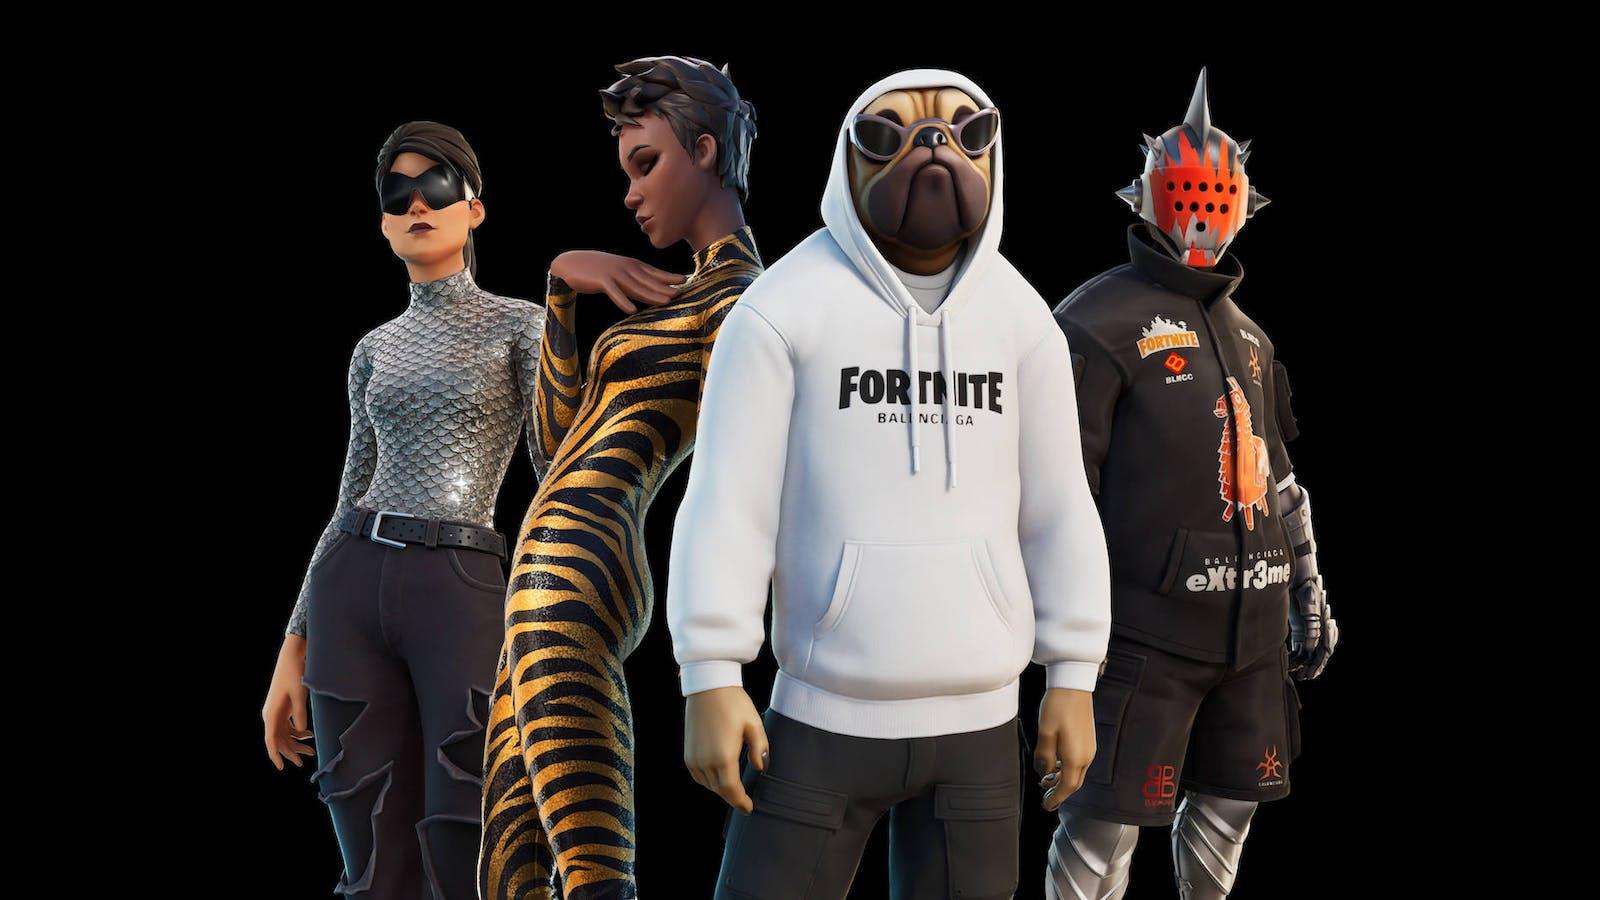 Fortnite characters sporting Balenciaga outfits, a recent metaverse-forward partnership. Credit: Epic Games